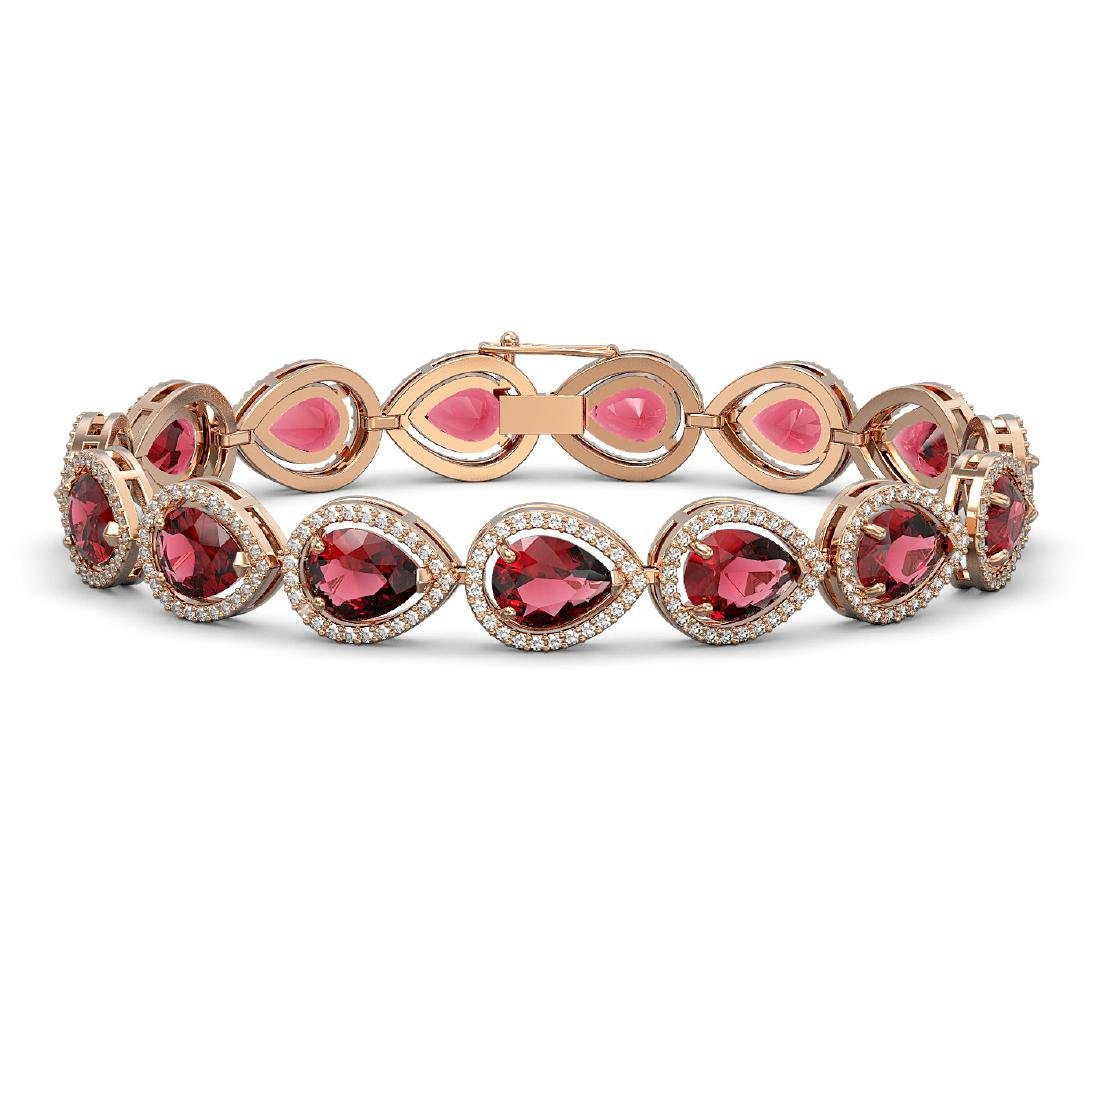 19.7 CTW Tourmaline & Diamond Halo Bracelet 10K Rose